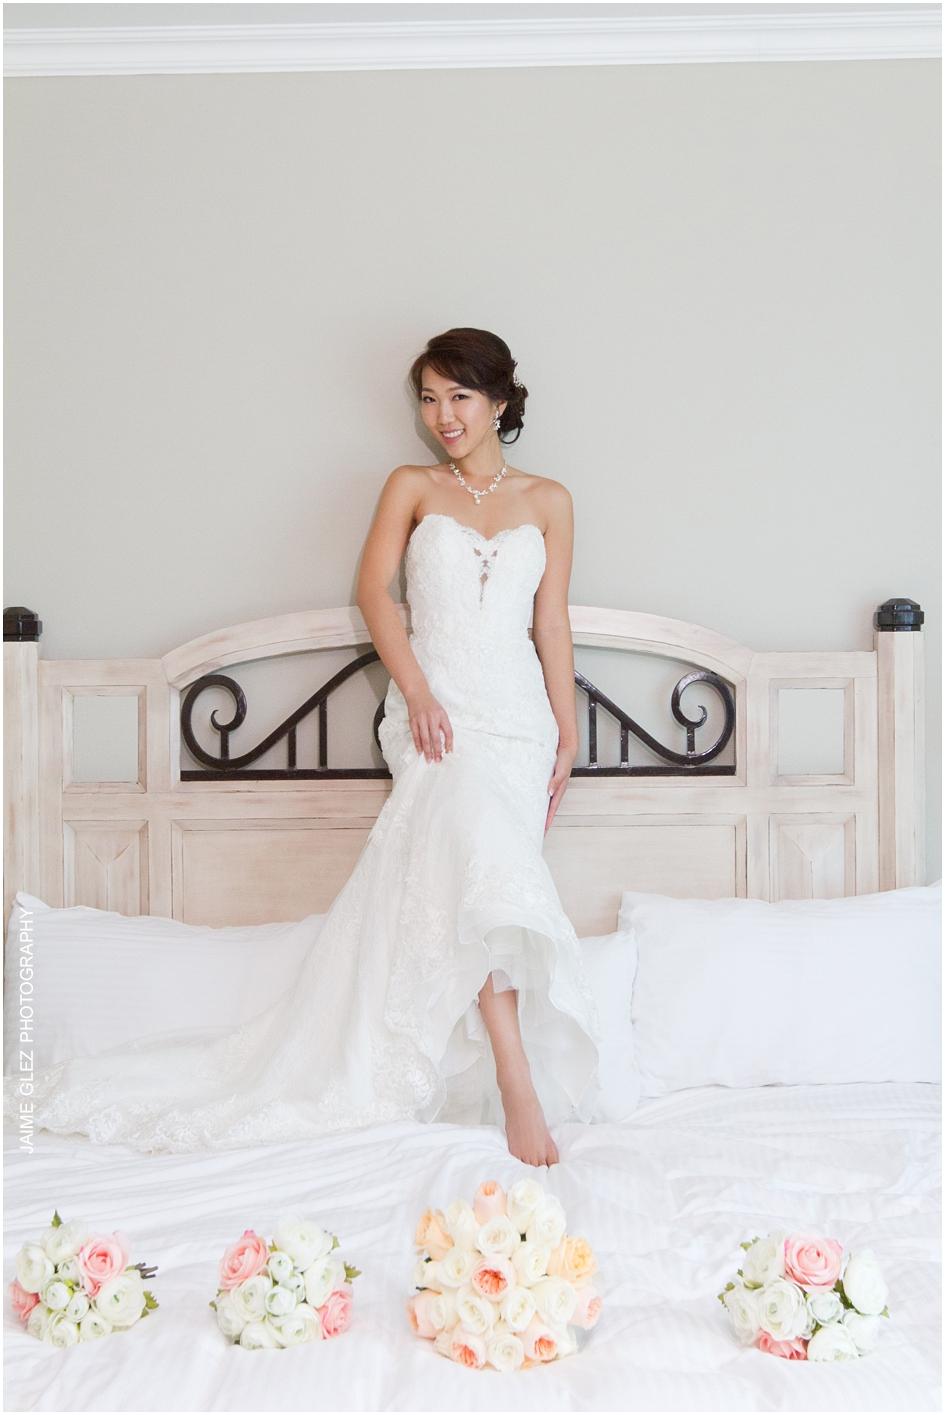 Sandos cancun luxury wedding 8